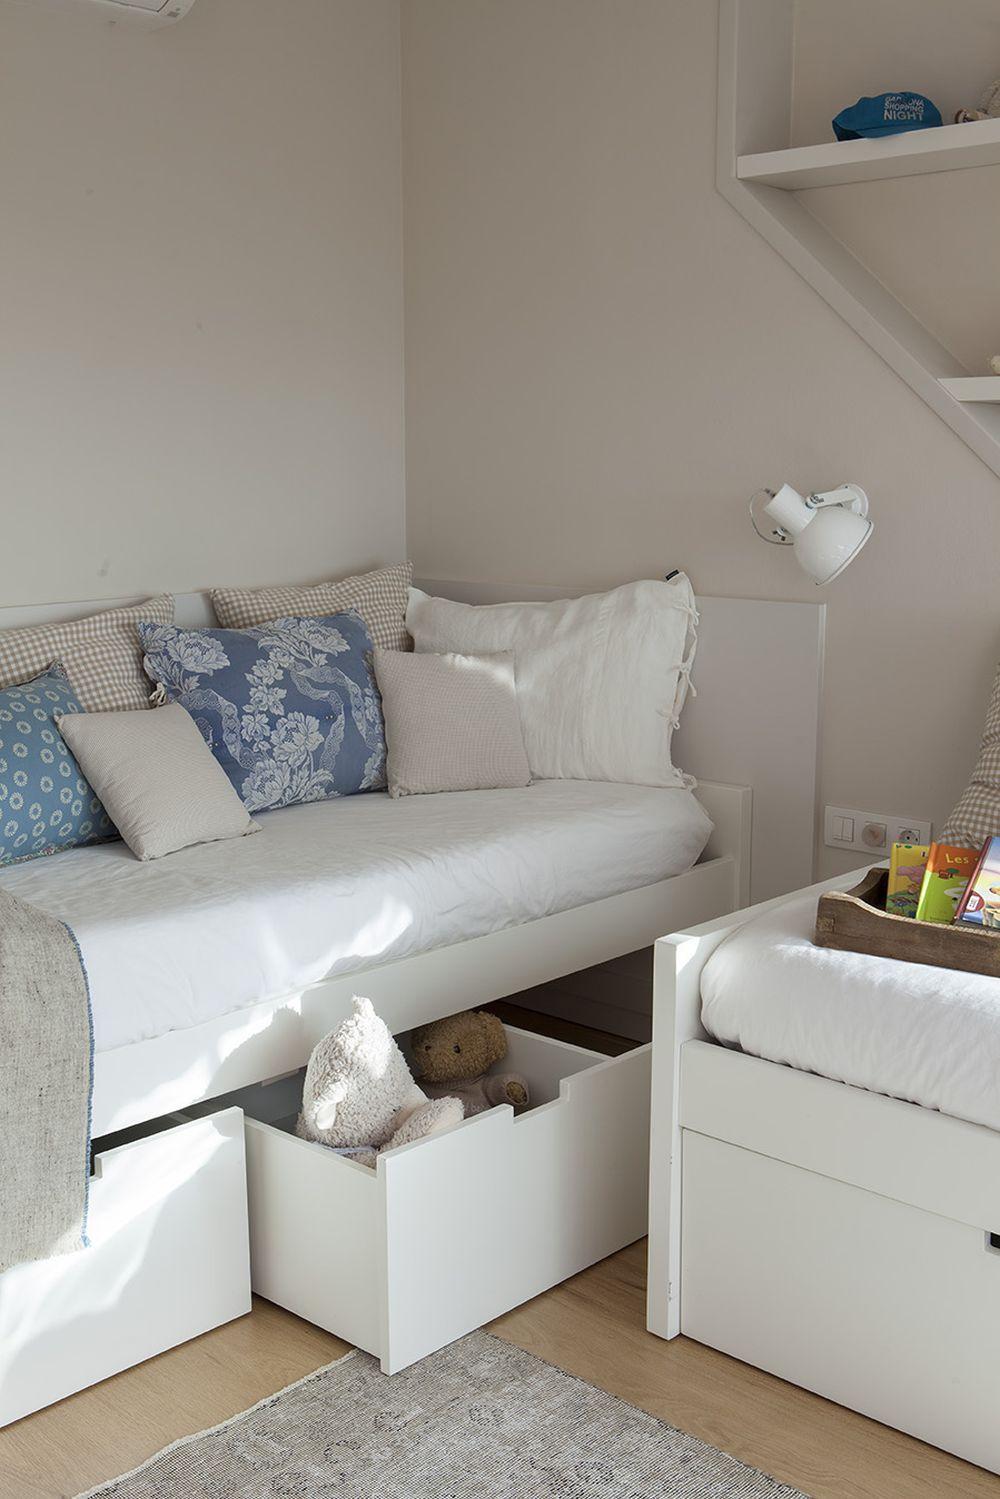 adelaparvu.com despre casa cu gradina, accente marine, designer Jeanette Dresing, Foto Feran Freixa (28)